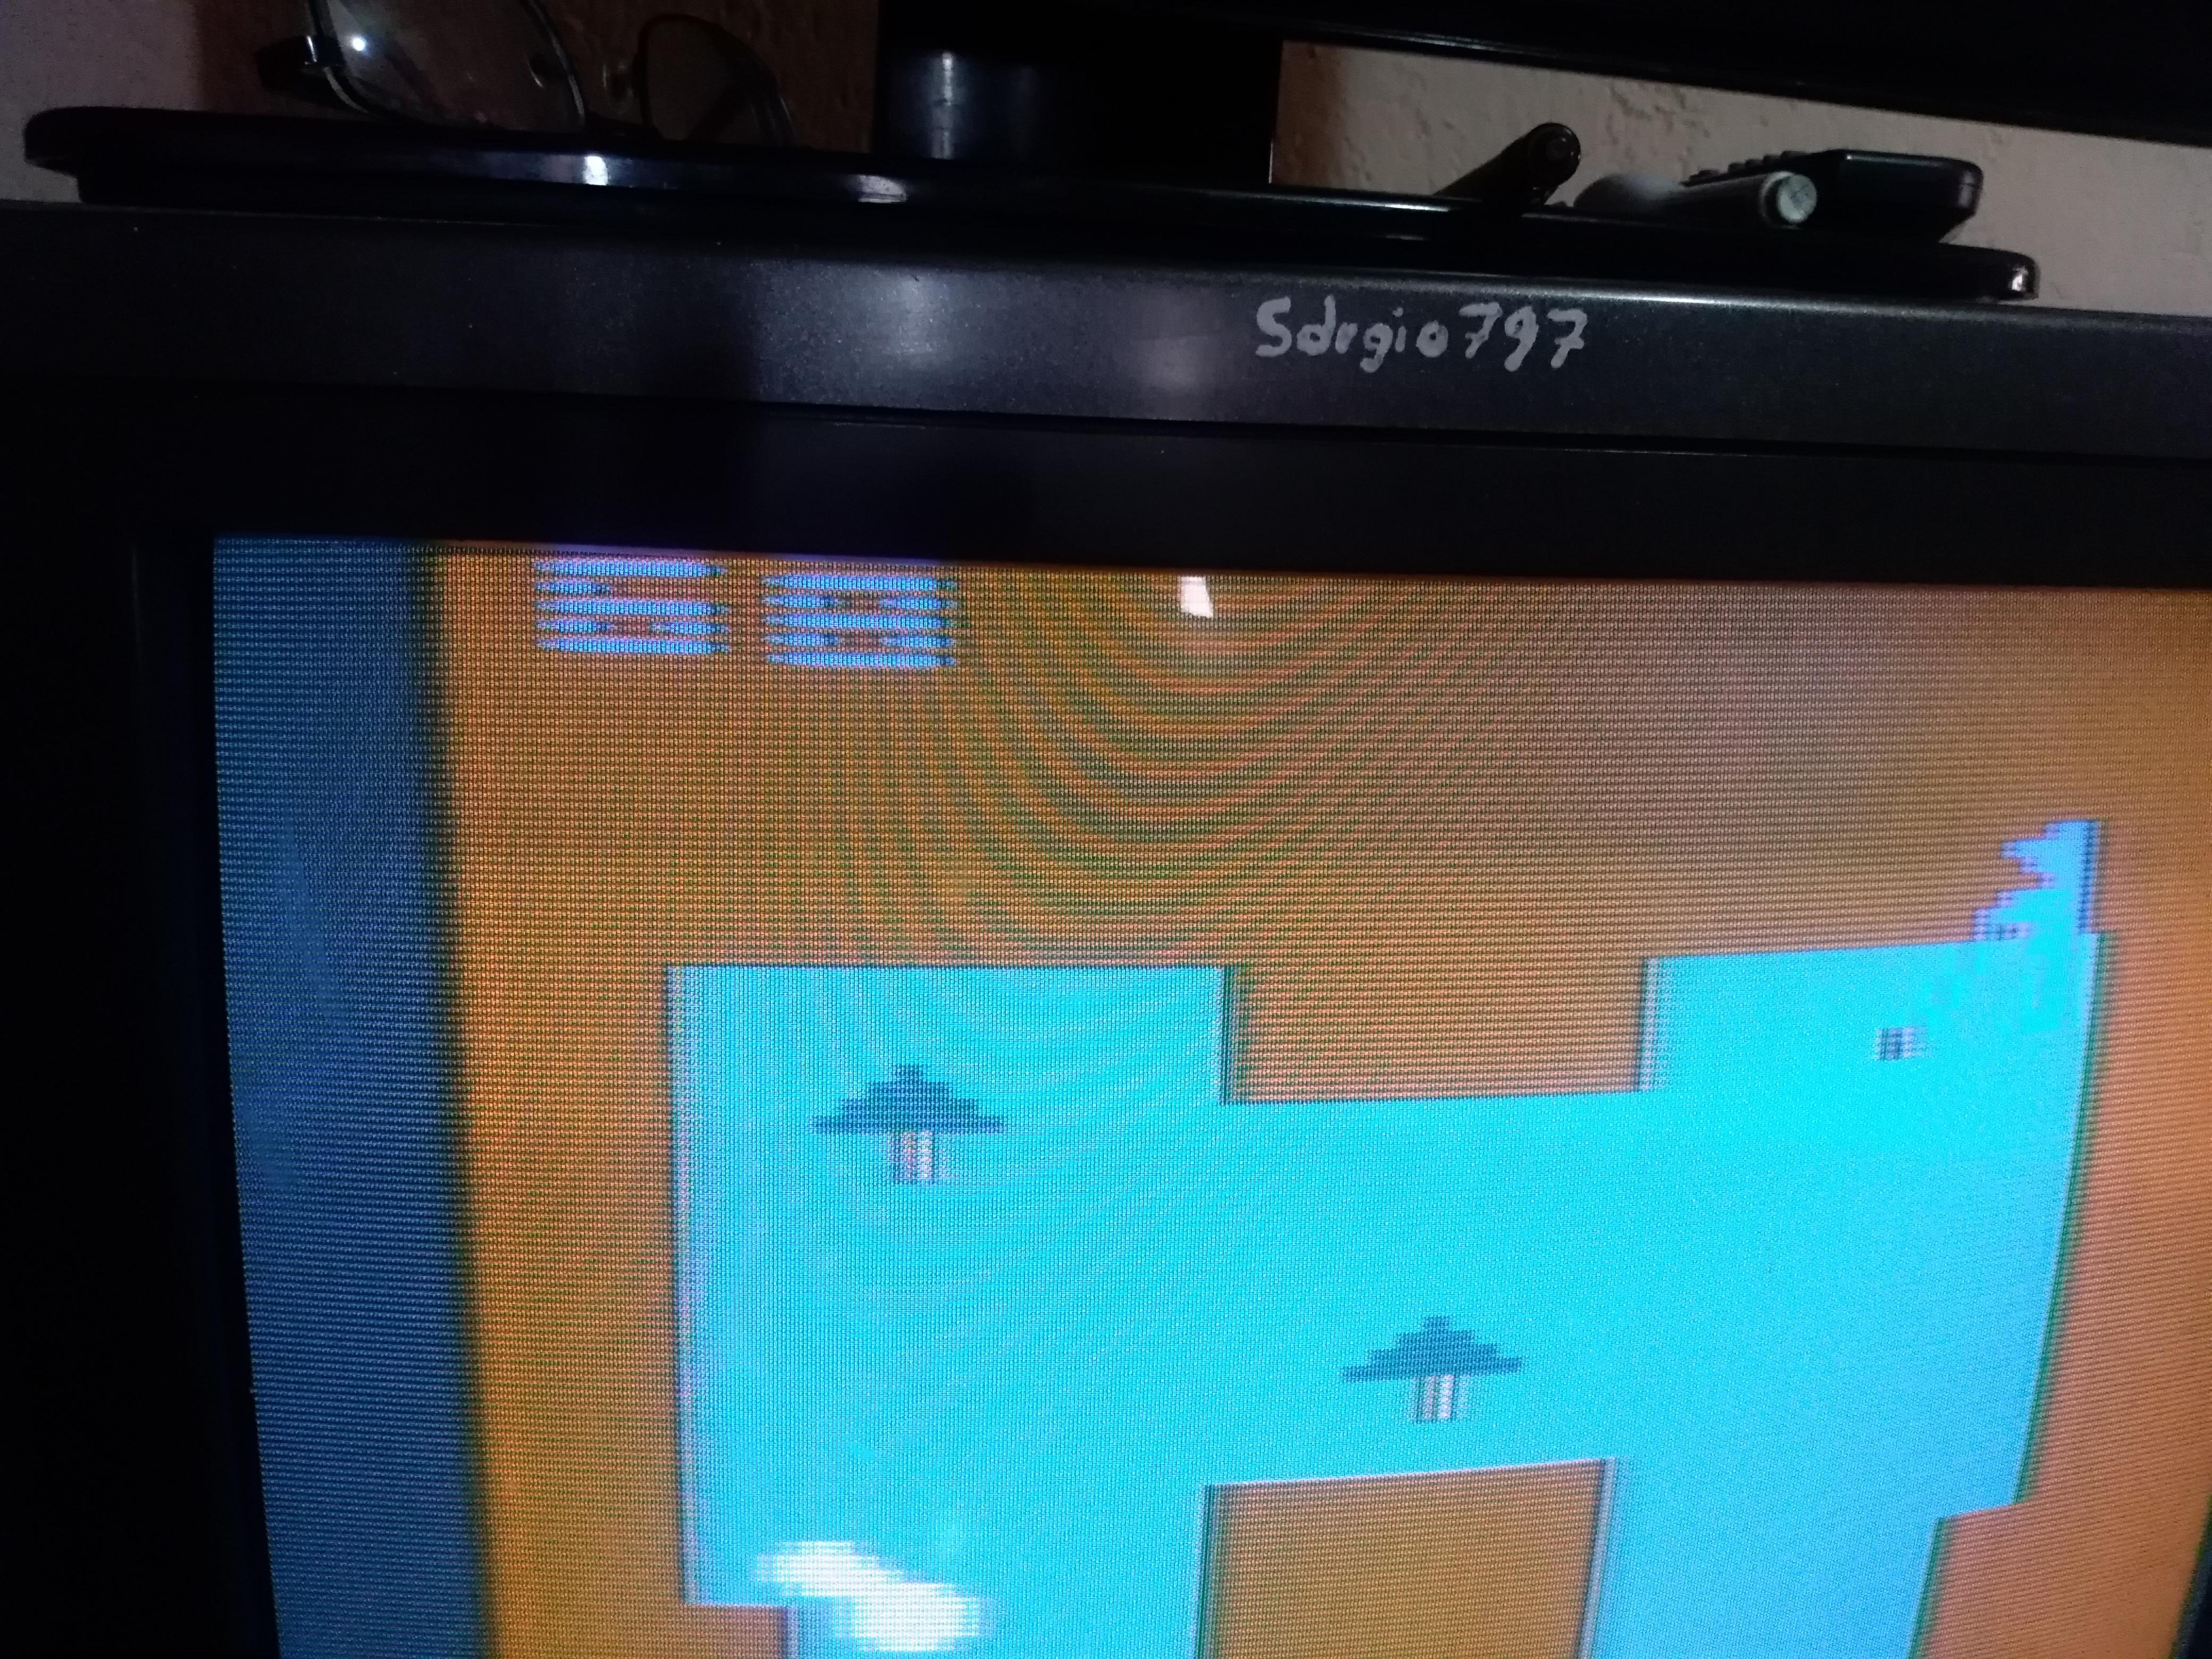 Sdrgio797: Golf  (Atari 2600 Novice/B) 68 points on 2020-06-30 14:50:17